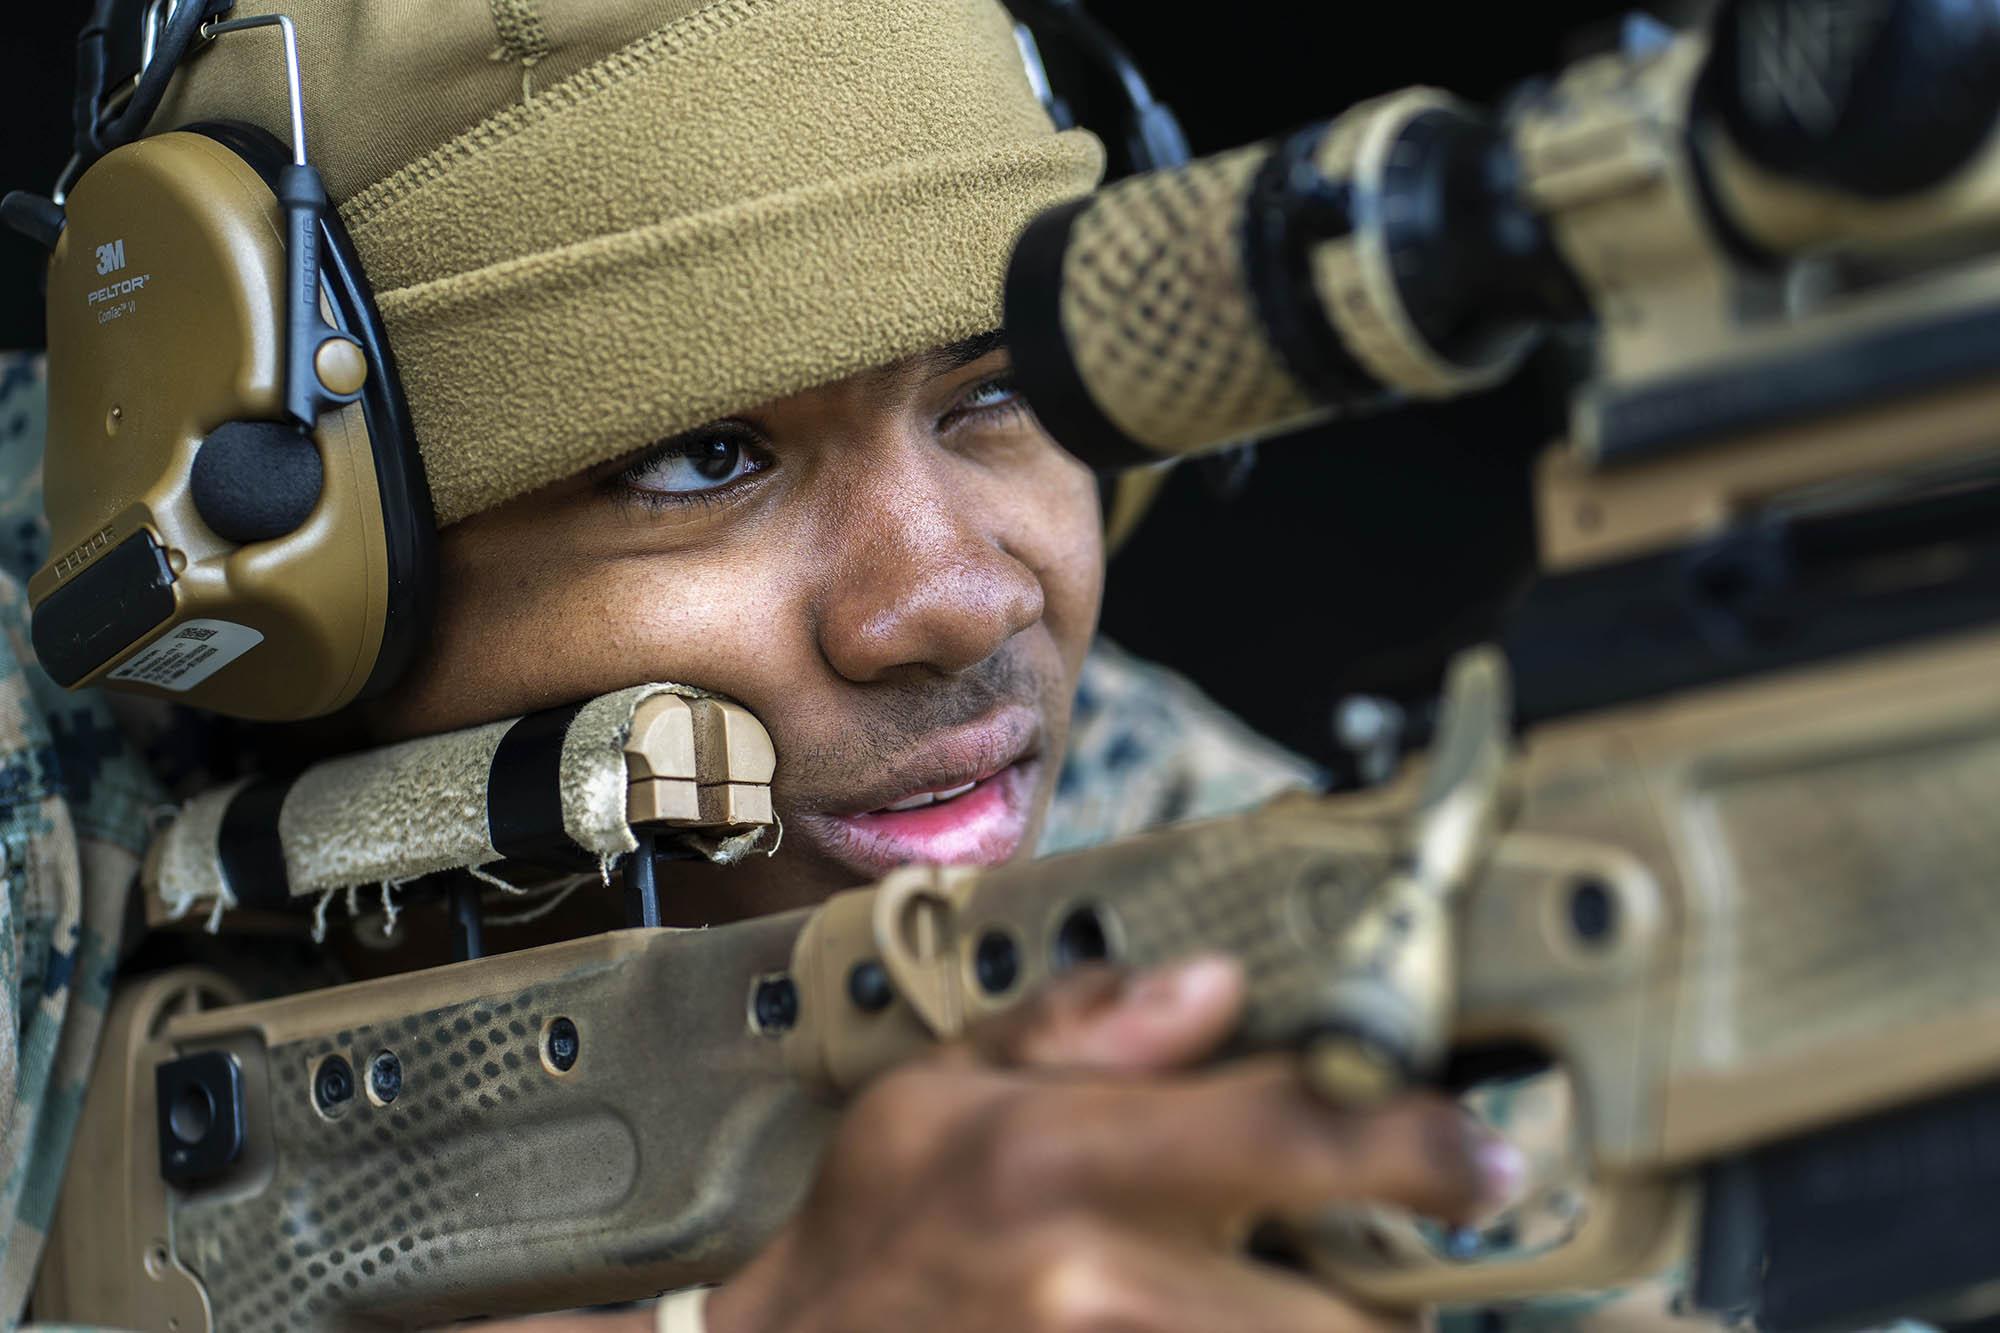 U.S. Marine Corps Lance Cpl. Jeremiah Riley-Caldwell fires an Mk13 Mod7 sniper rifle on Jan. 28, 2021, during a pre-sniper qualification course at Camp Hansen, Okinawa. (Lance Cpl. Juan Carpanzano/Marine Corps)